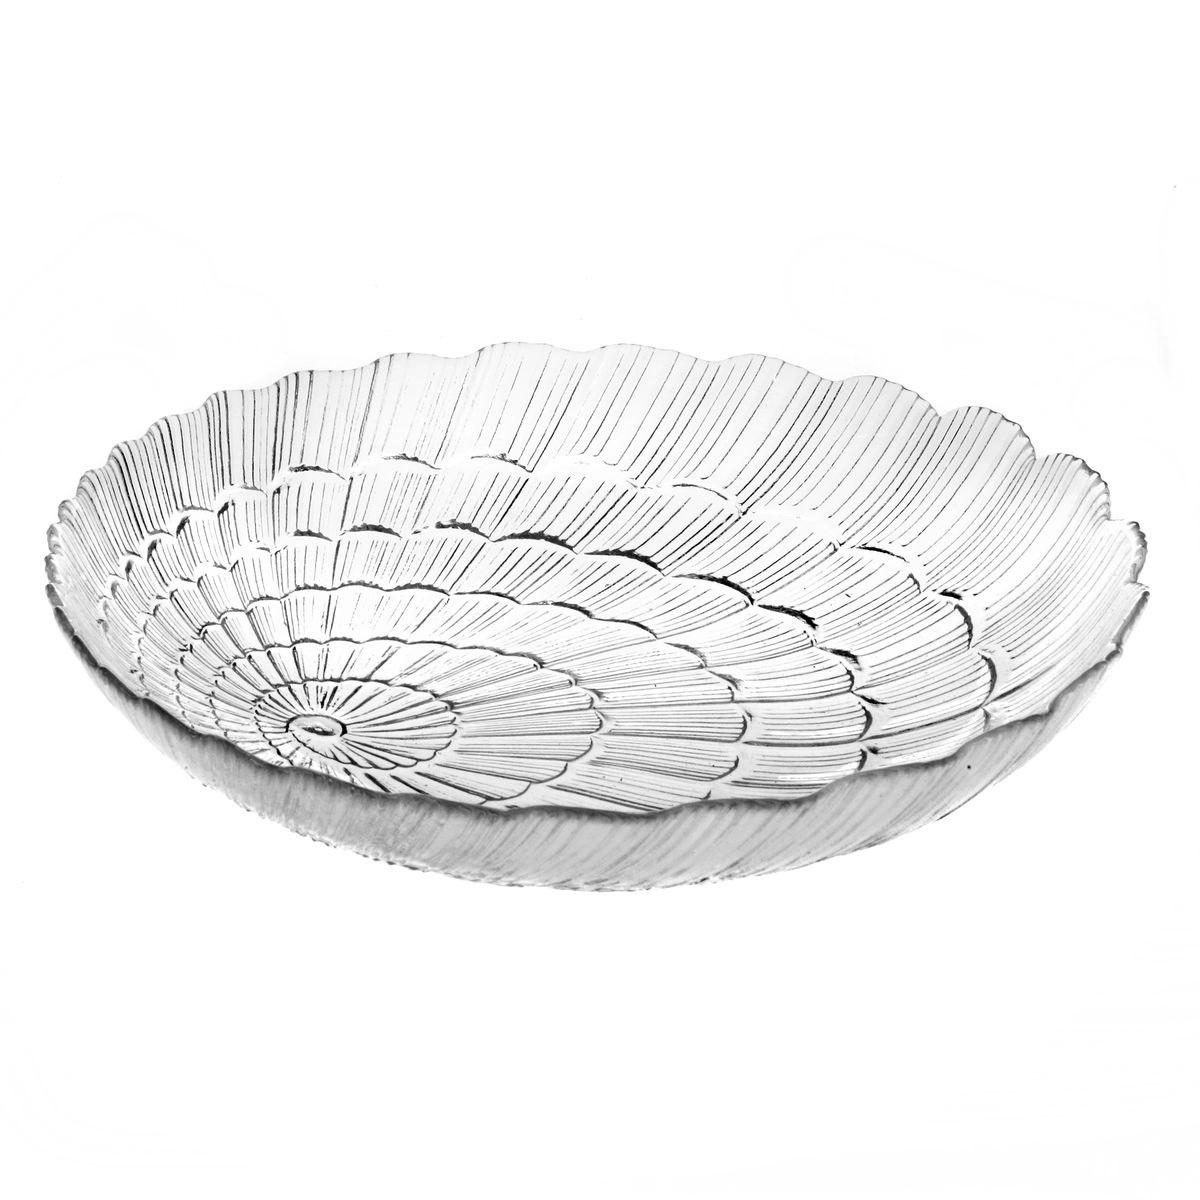 Набор тарелок Pasabahce Atlantis, диаметр 21 см, 6 шт